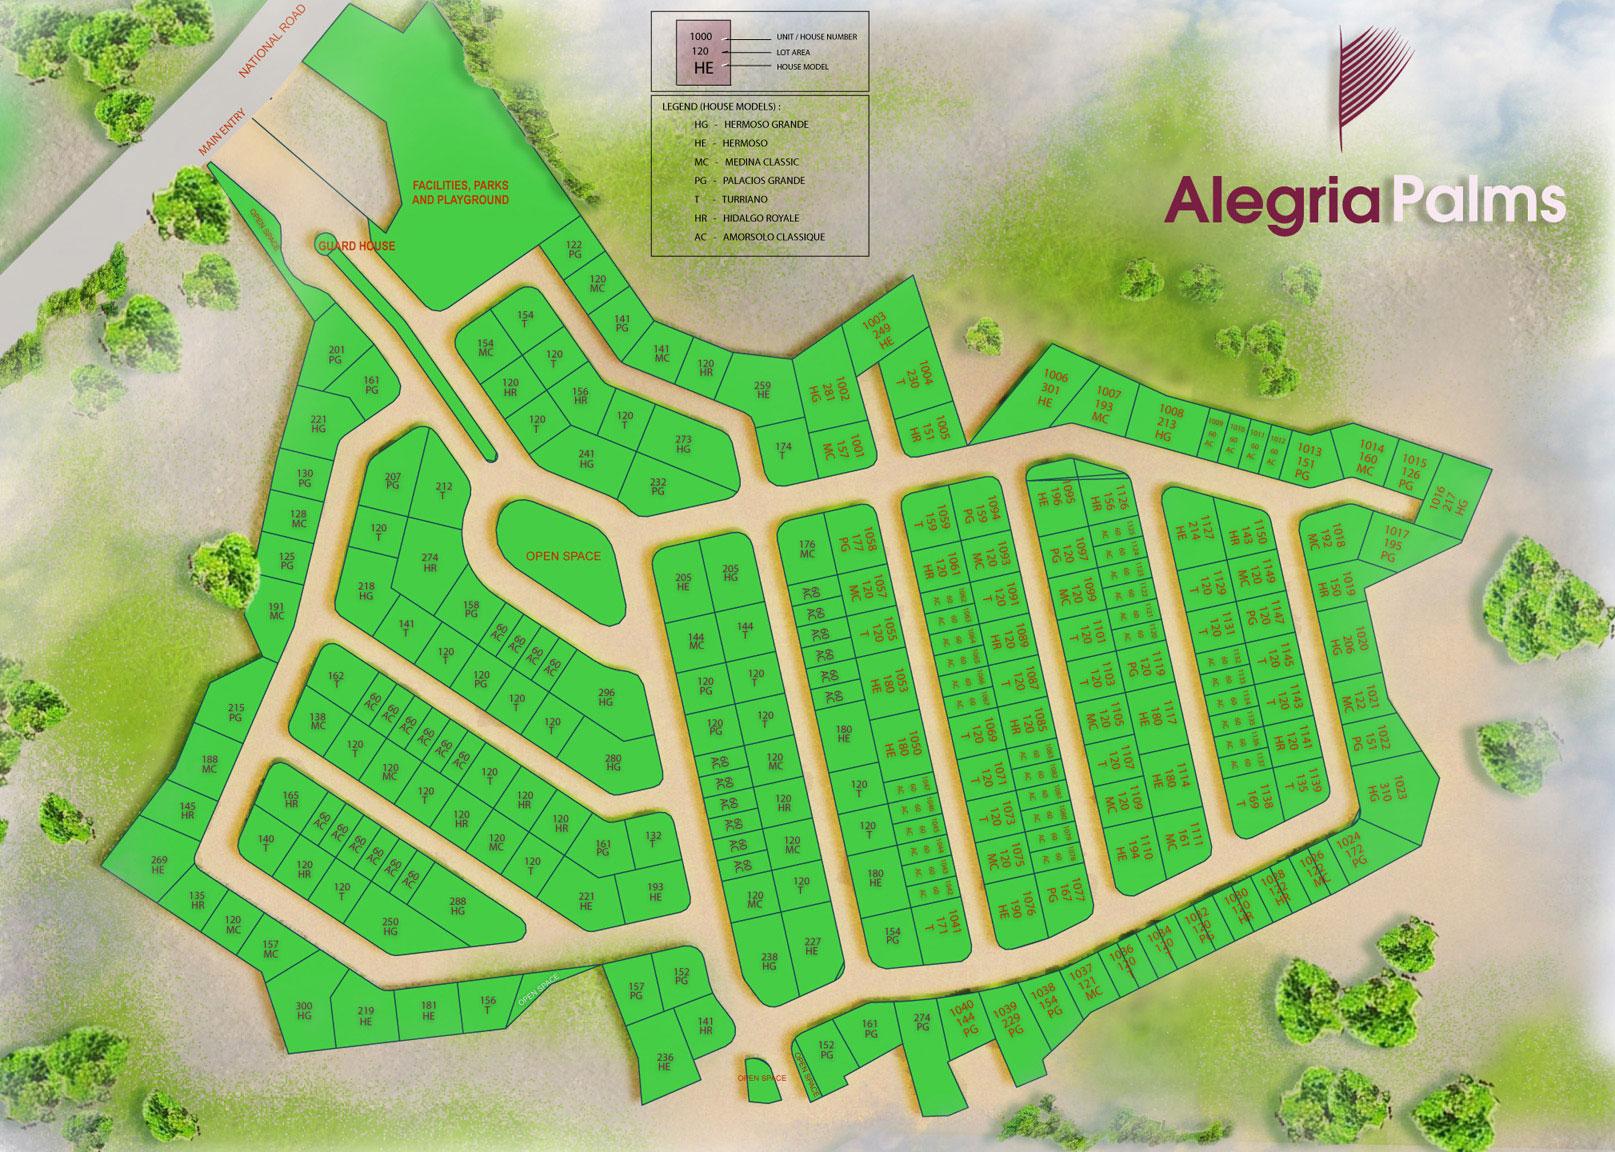 Cordova, Mactan, Cebu Real Estate Home Lot For Sale at Alegria Palms ...